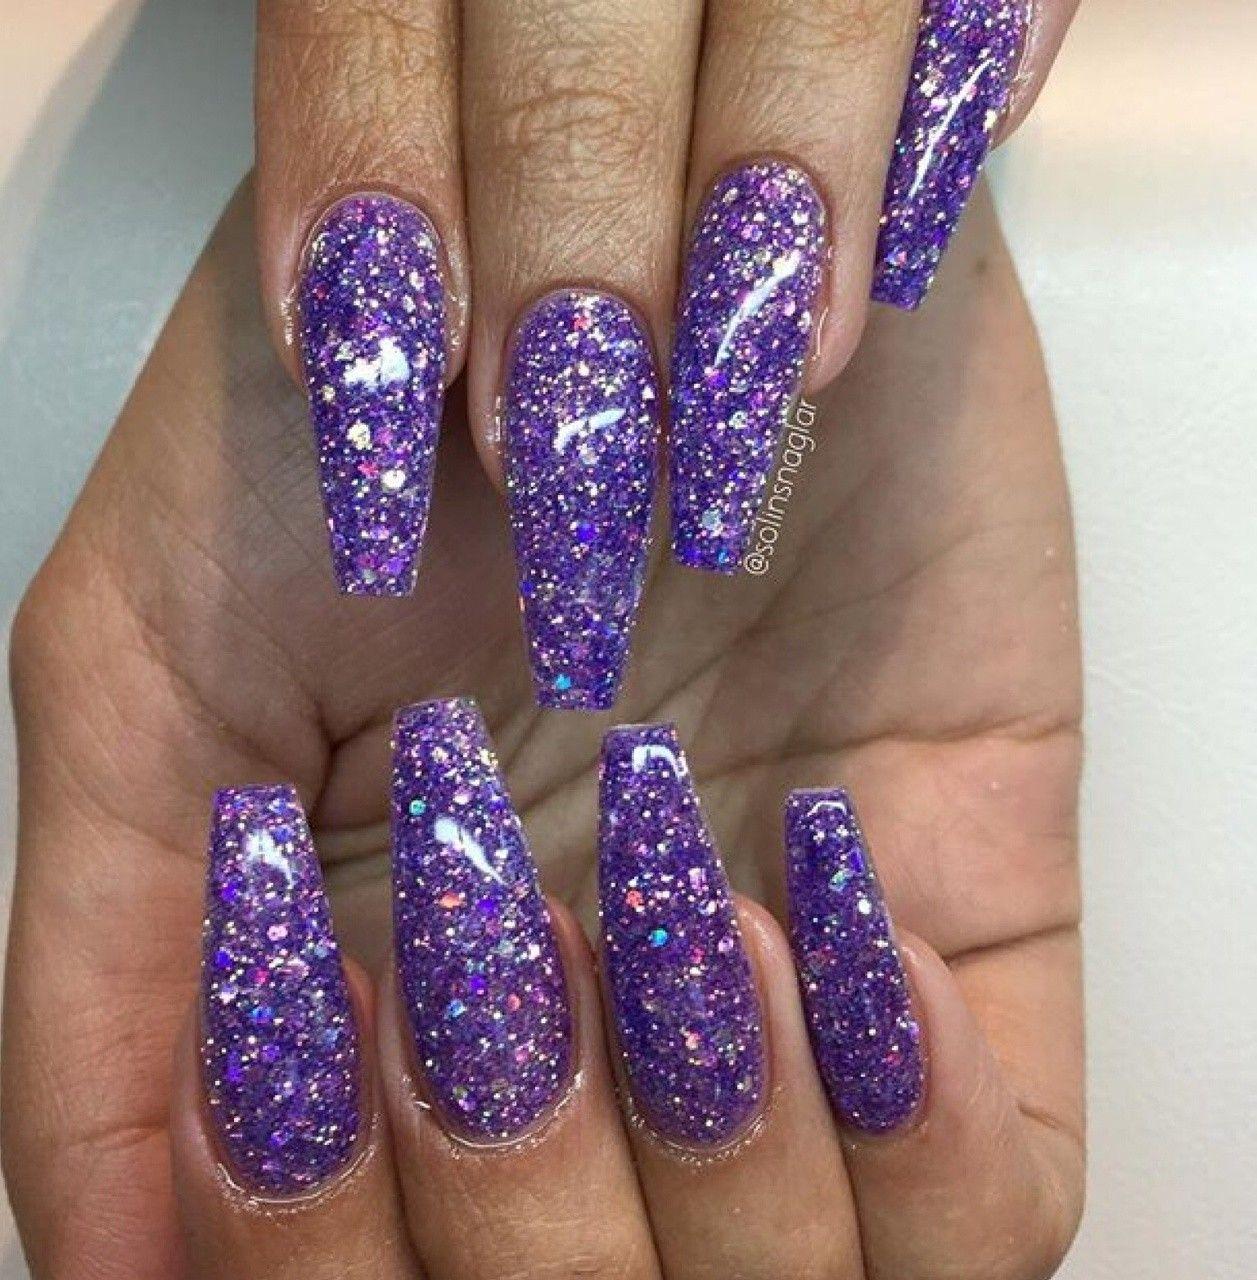 Pin by Vilvin Martinez on Nails | Purple glitter nails ...